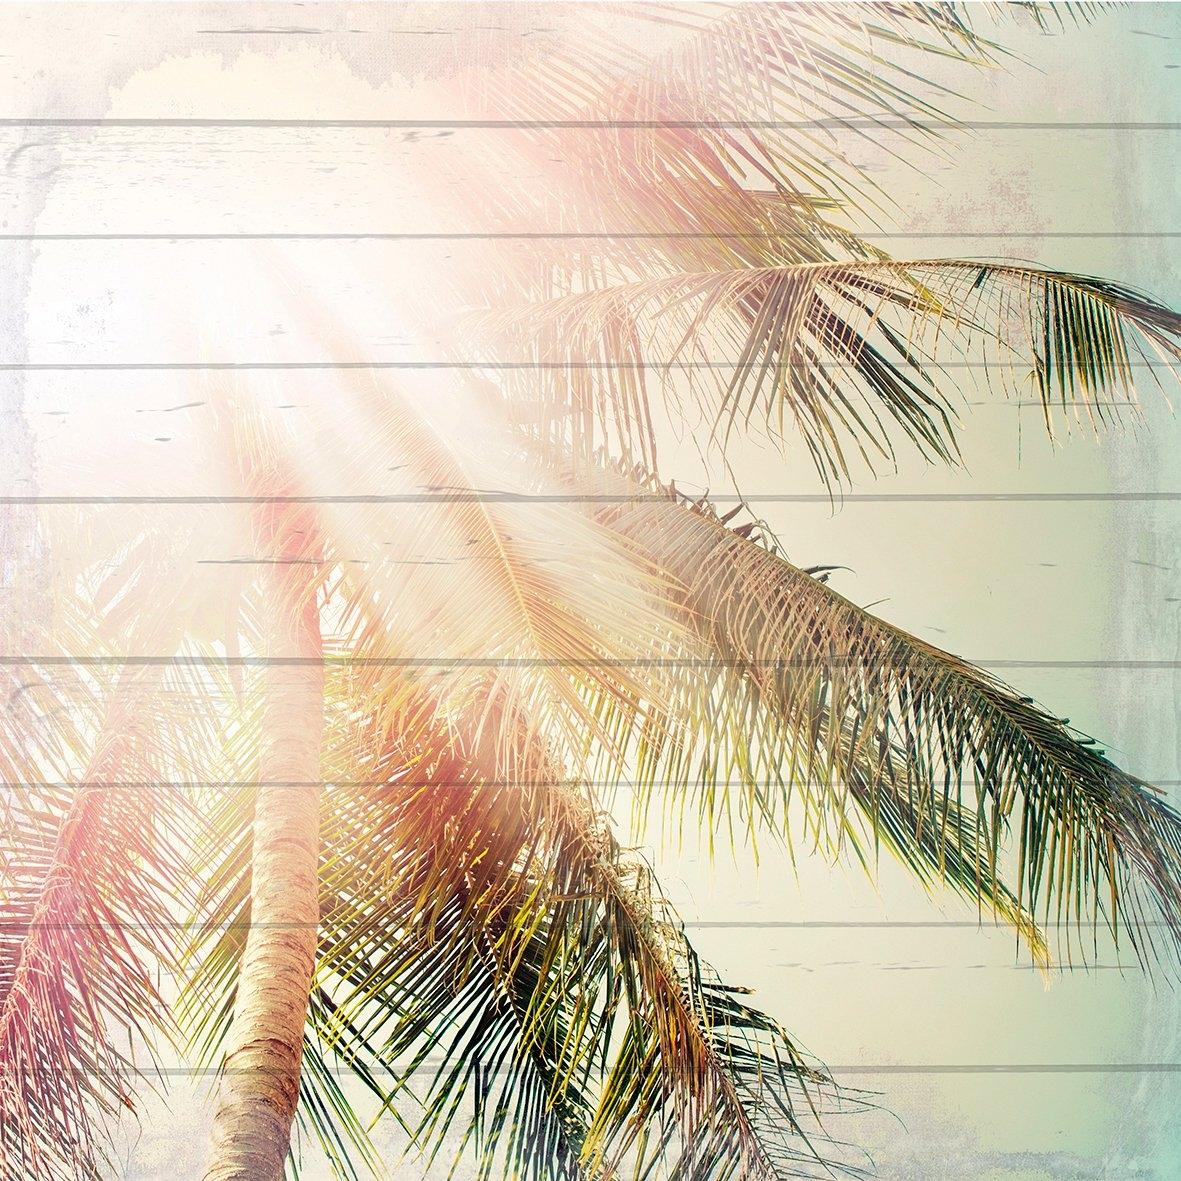 queence Artprint op hout »zonnige palmen«, 40x40 cm echt hout bestellen: 30 dagen bedenktijd